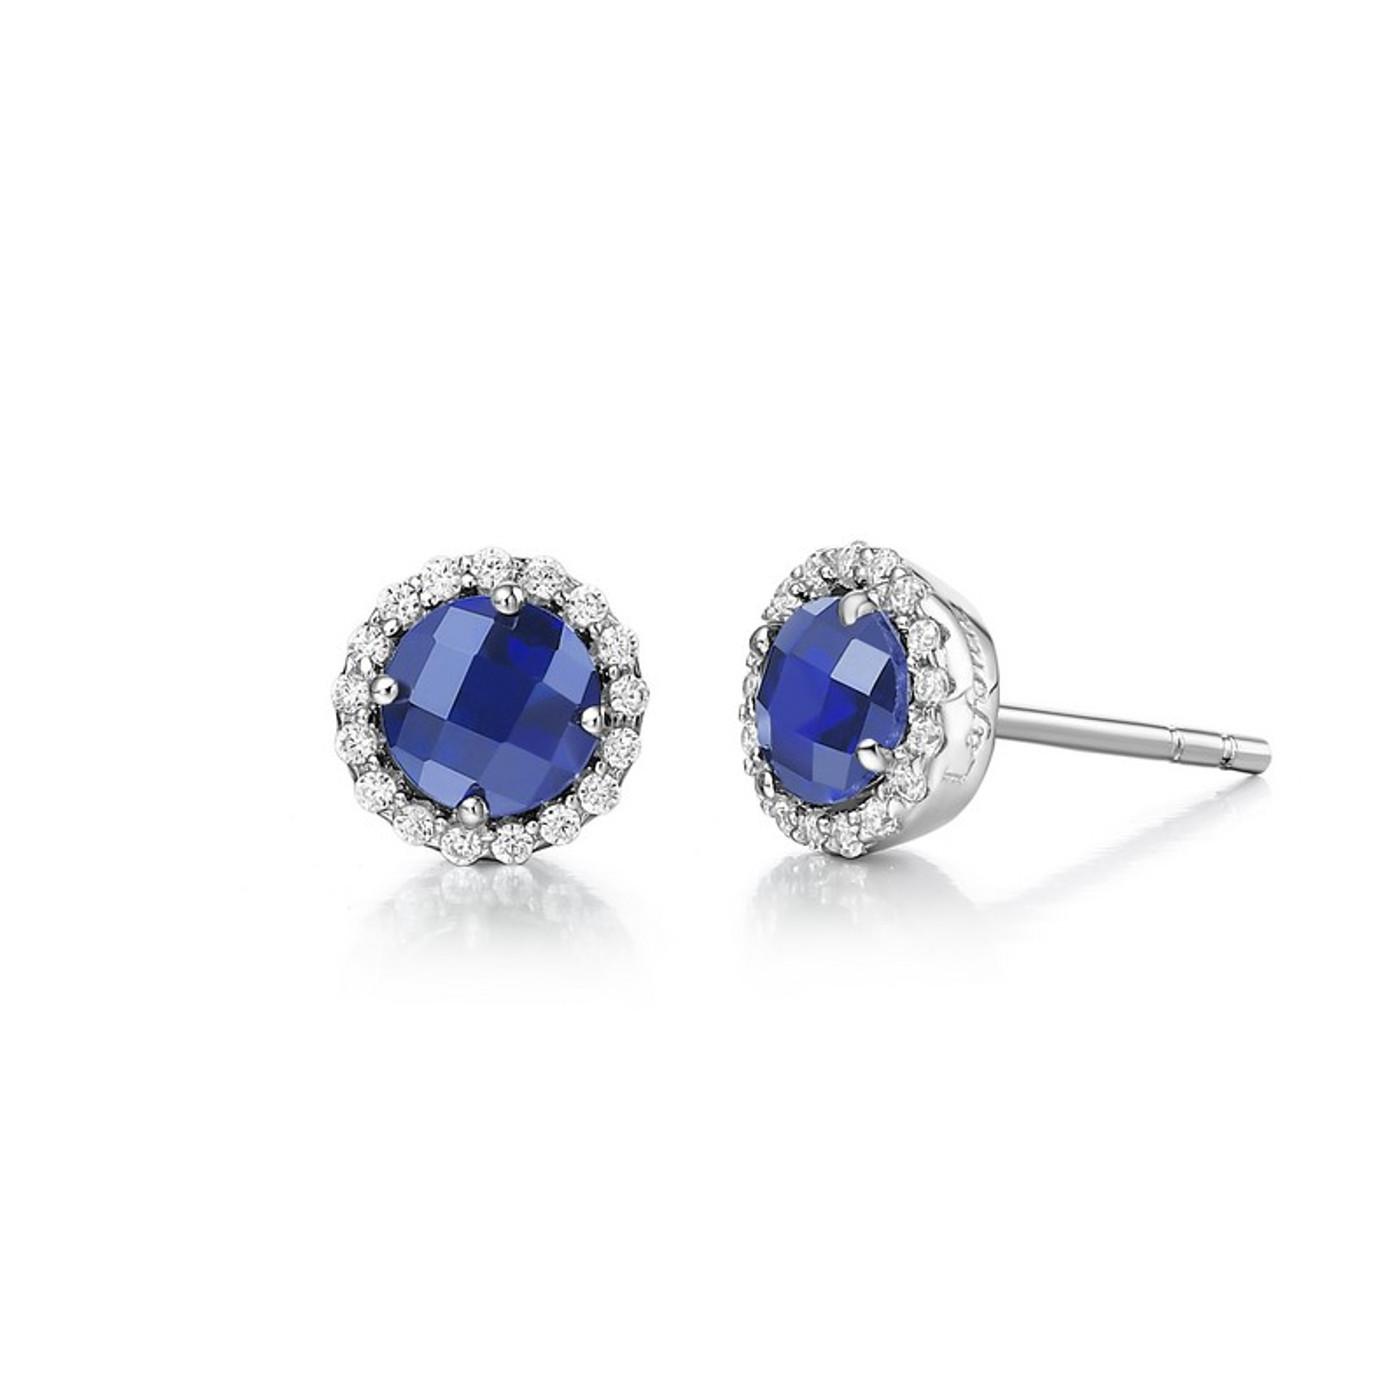 Sterling Silver Simulated Sapphire & Diamond Stud Earrings